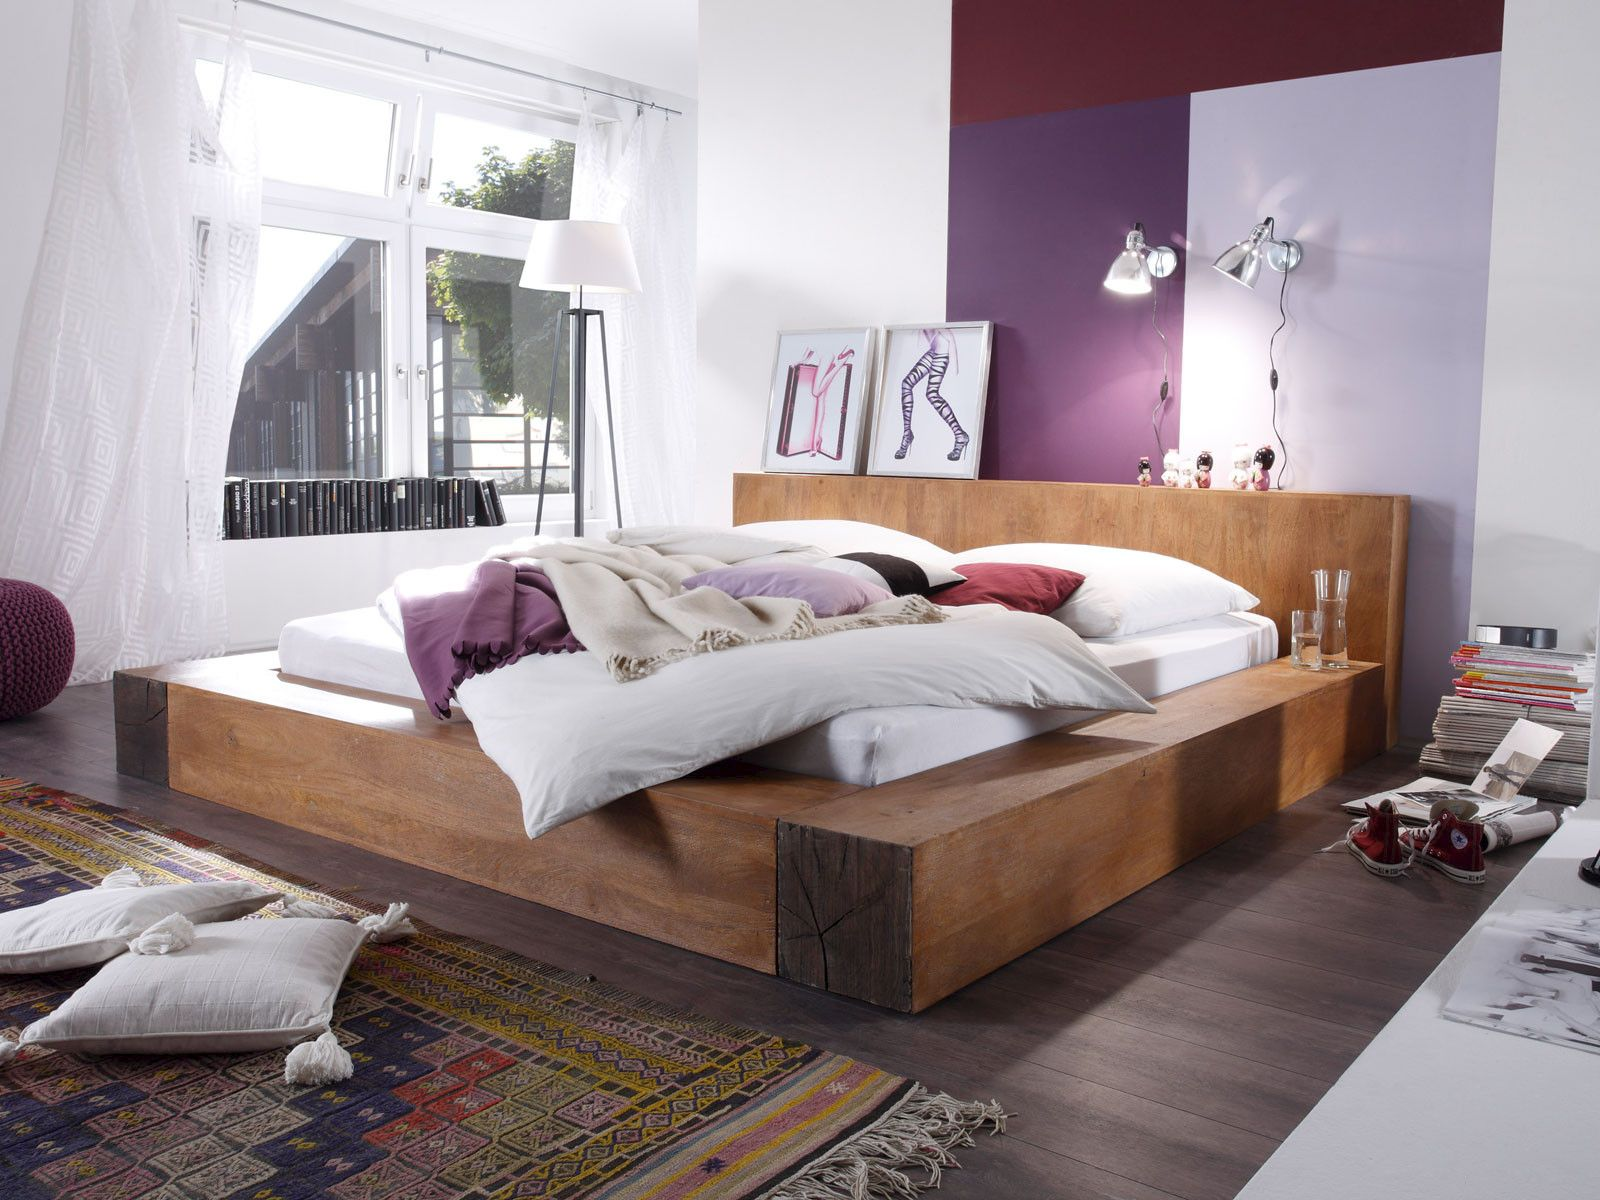 Mangoholzbett Dunas Bett mit schubladen, Bett ideen und